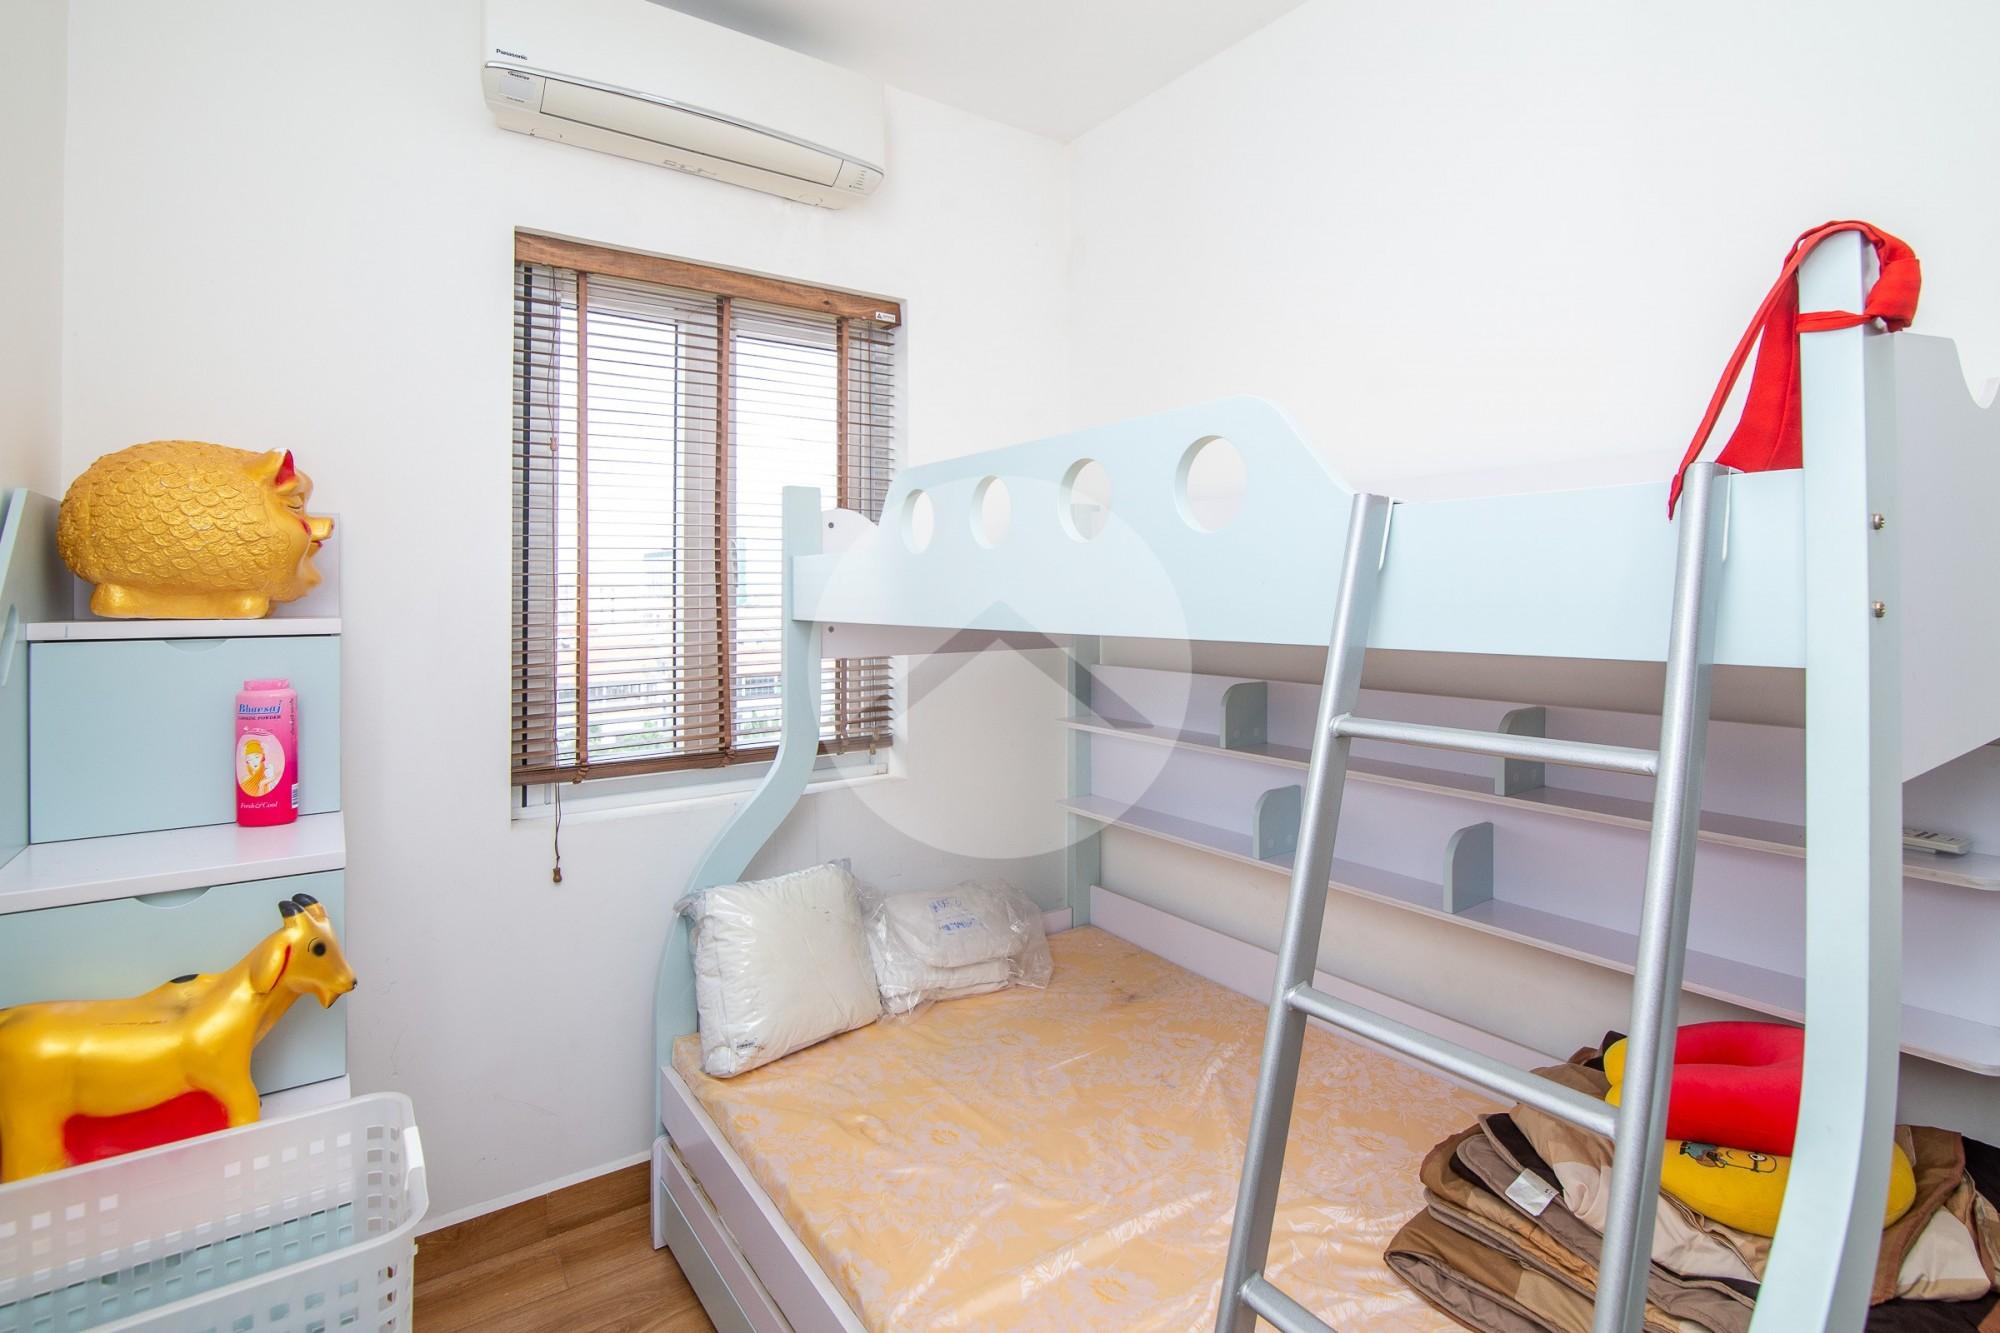 2 Bedroom Condo For Rent - Boeung Tumpun, Phnom Penh